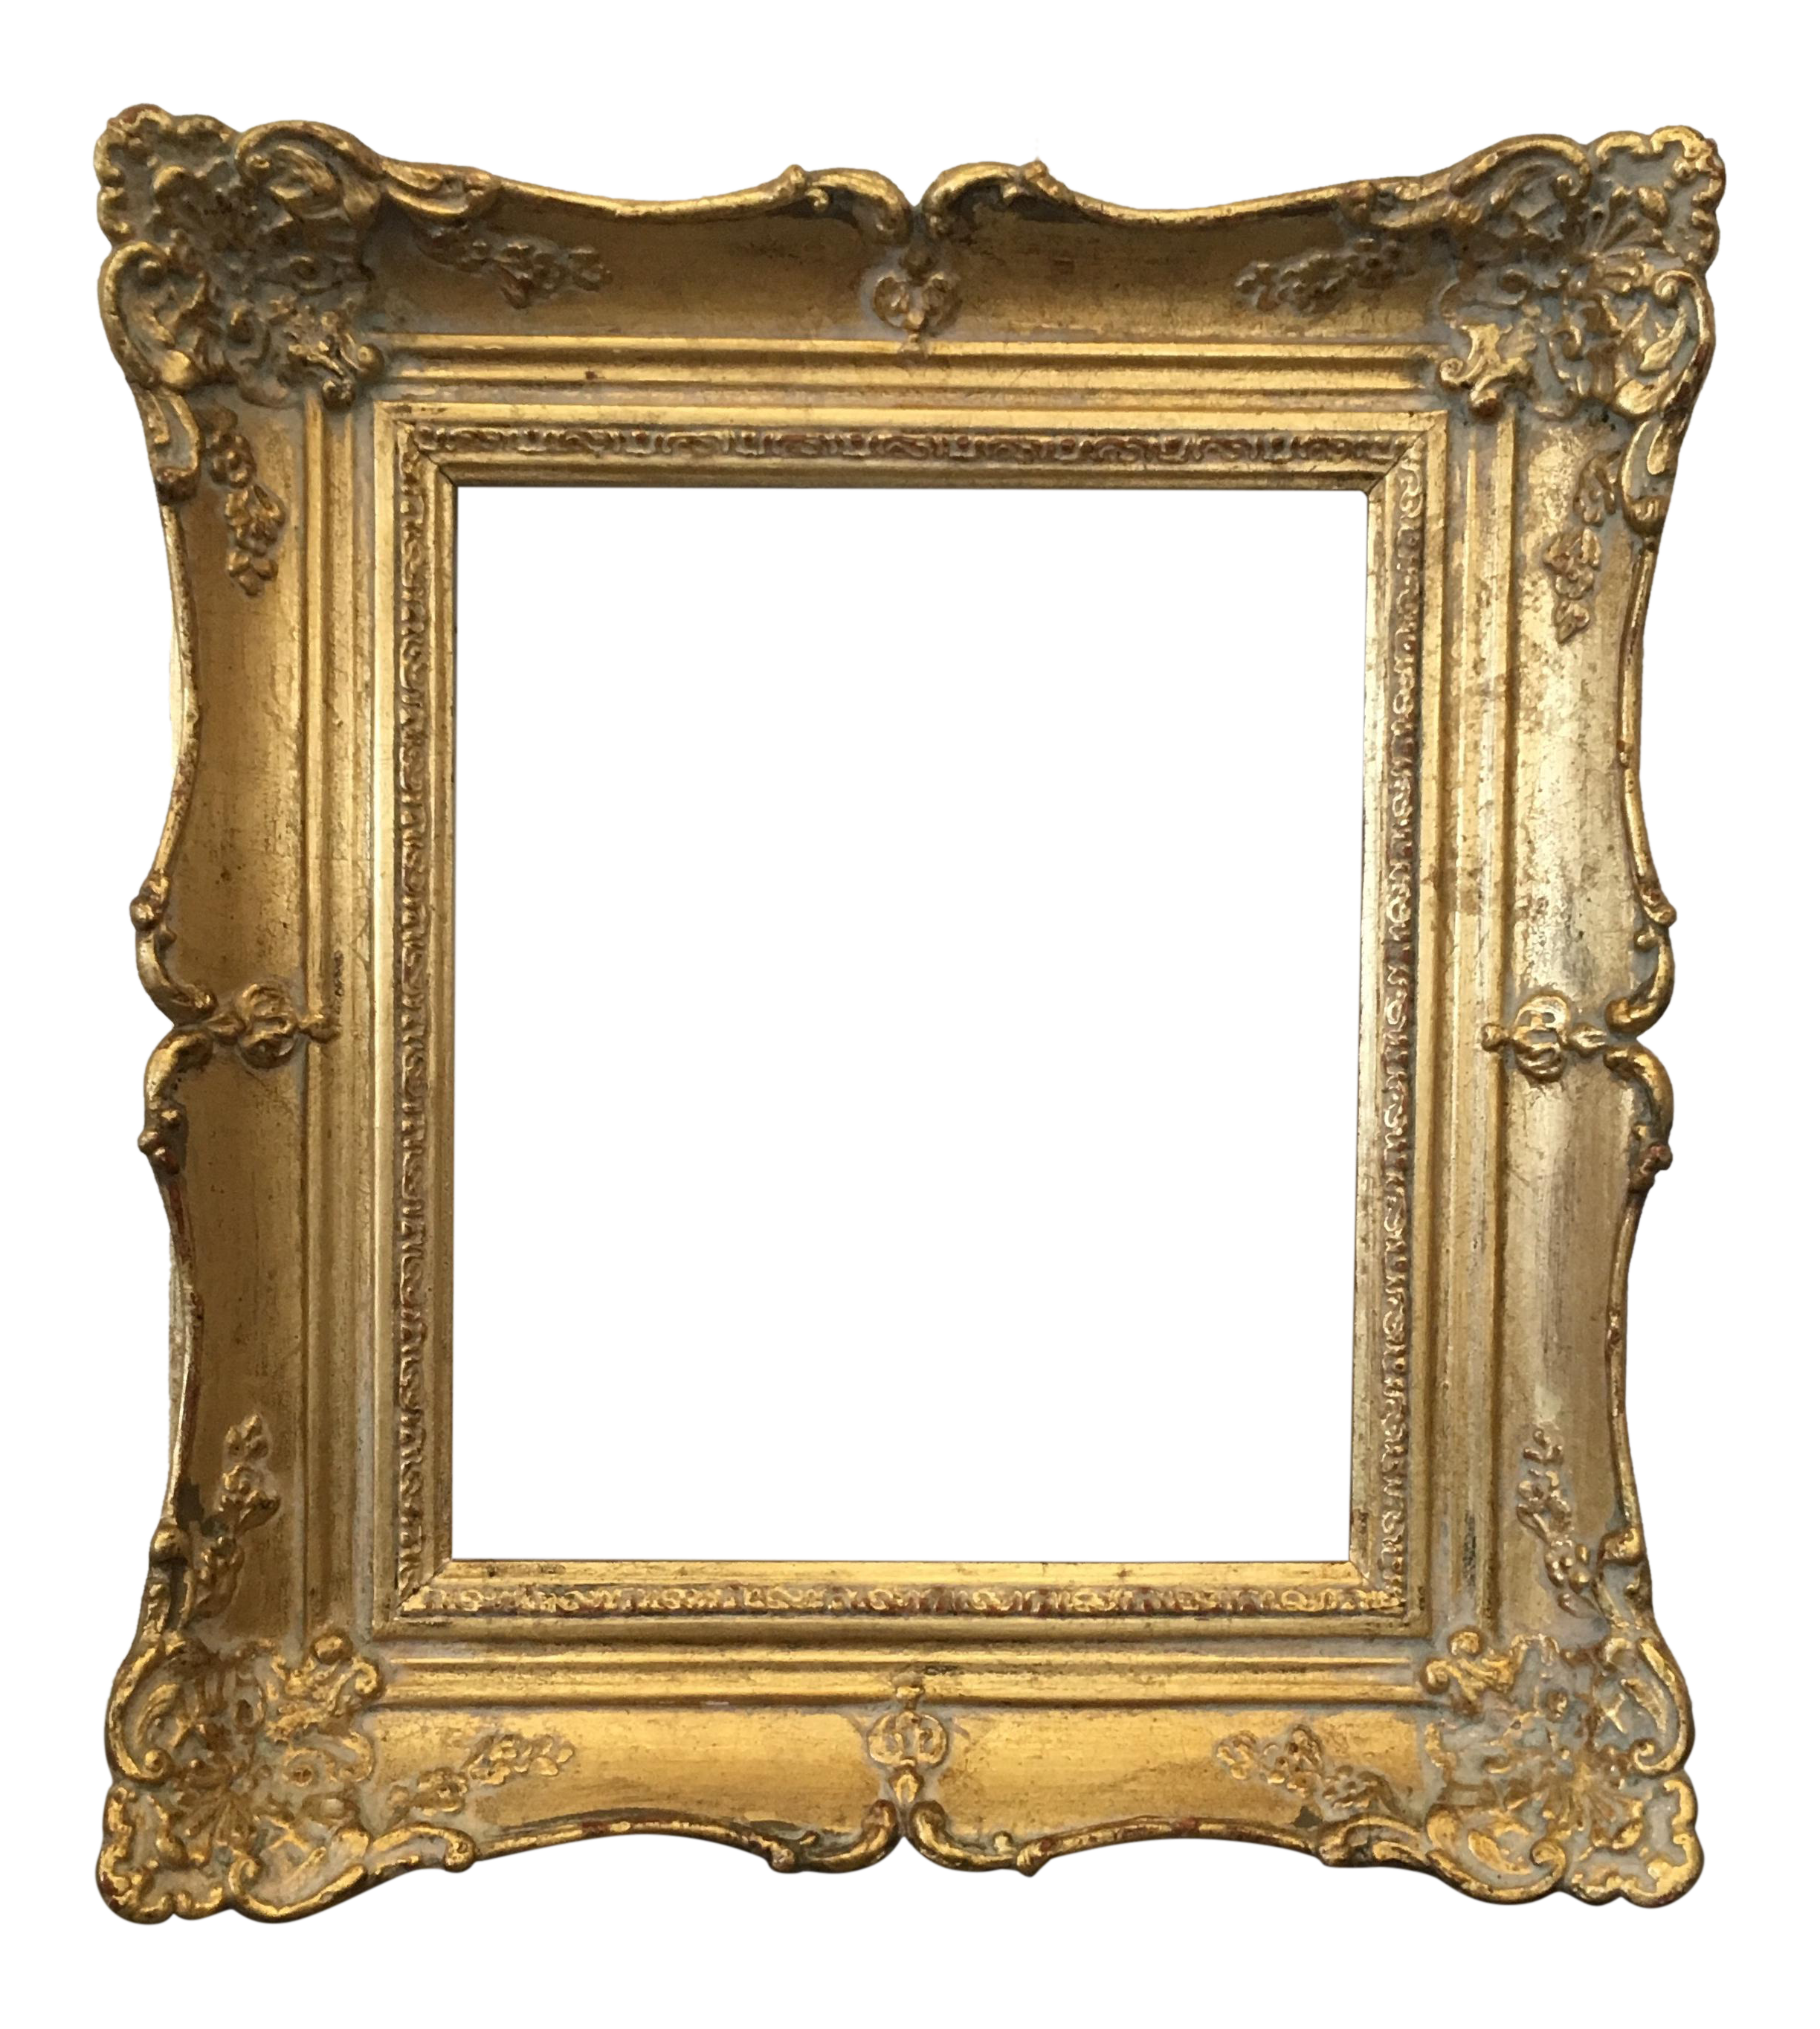 Vintage wood frame png. Gold carved chairish